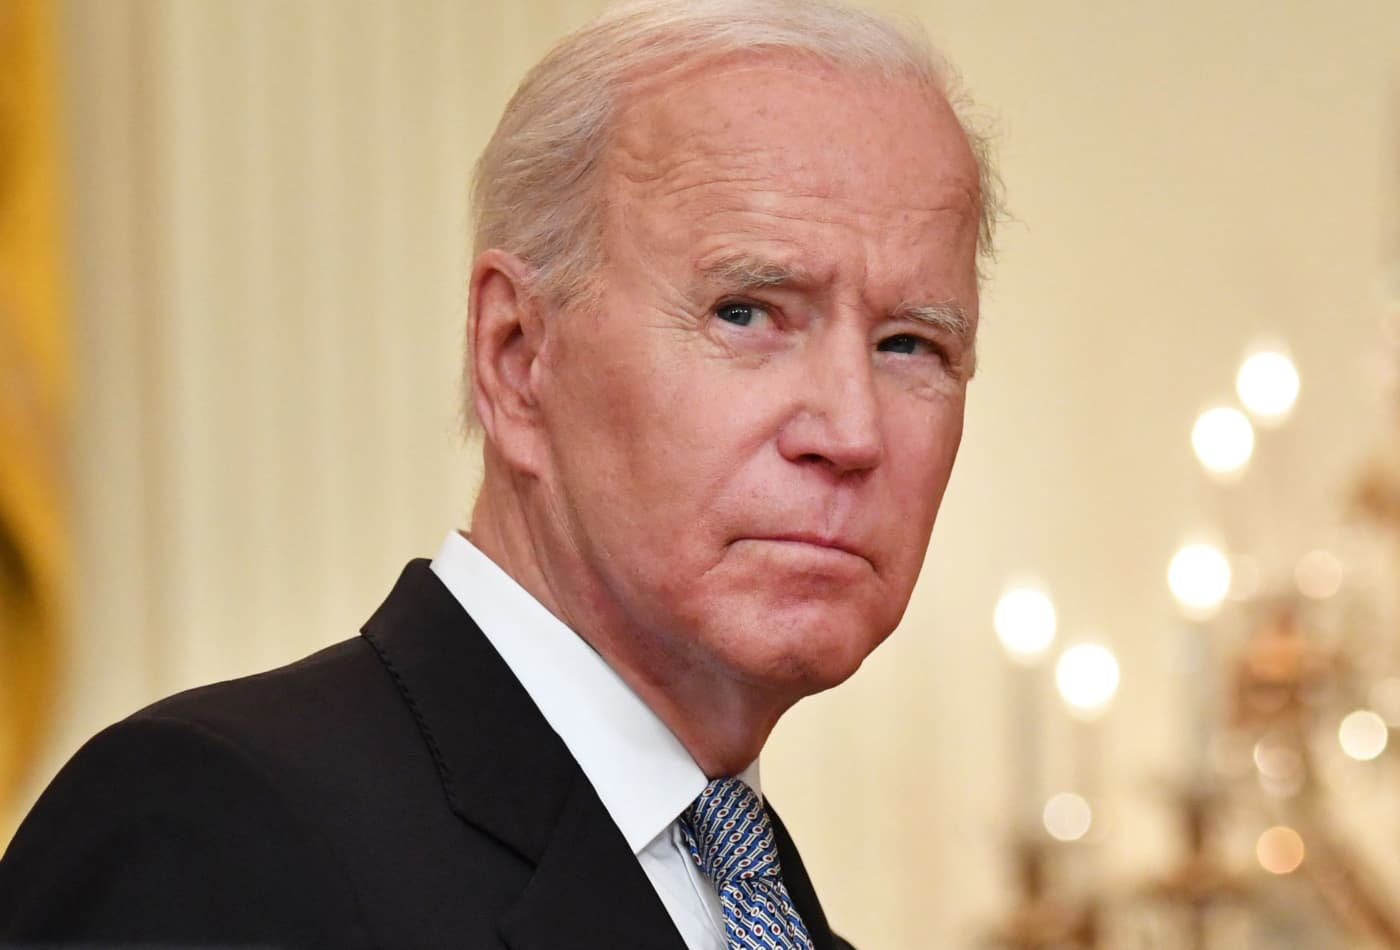 Biden tells Netanyahu U.S. supports ceasefire as Israel, Hamas conflict escalates